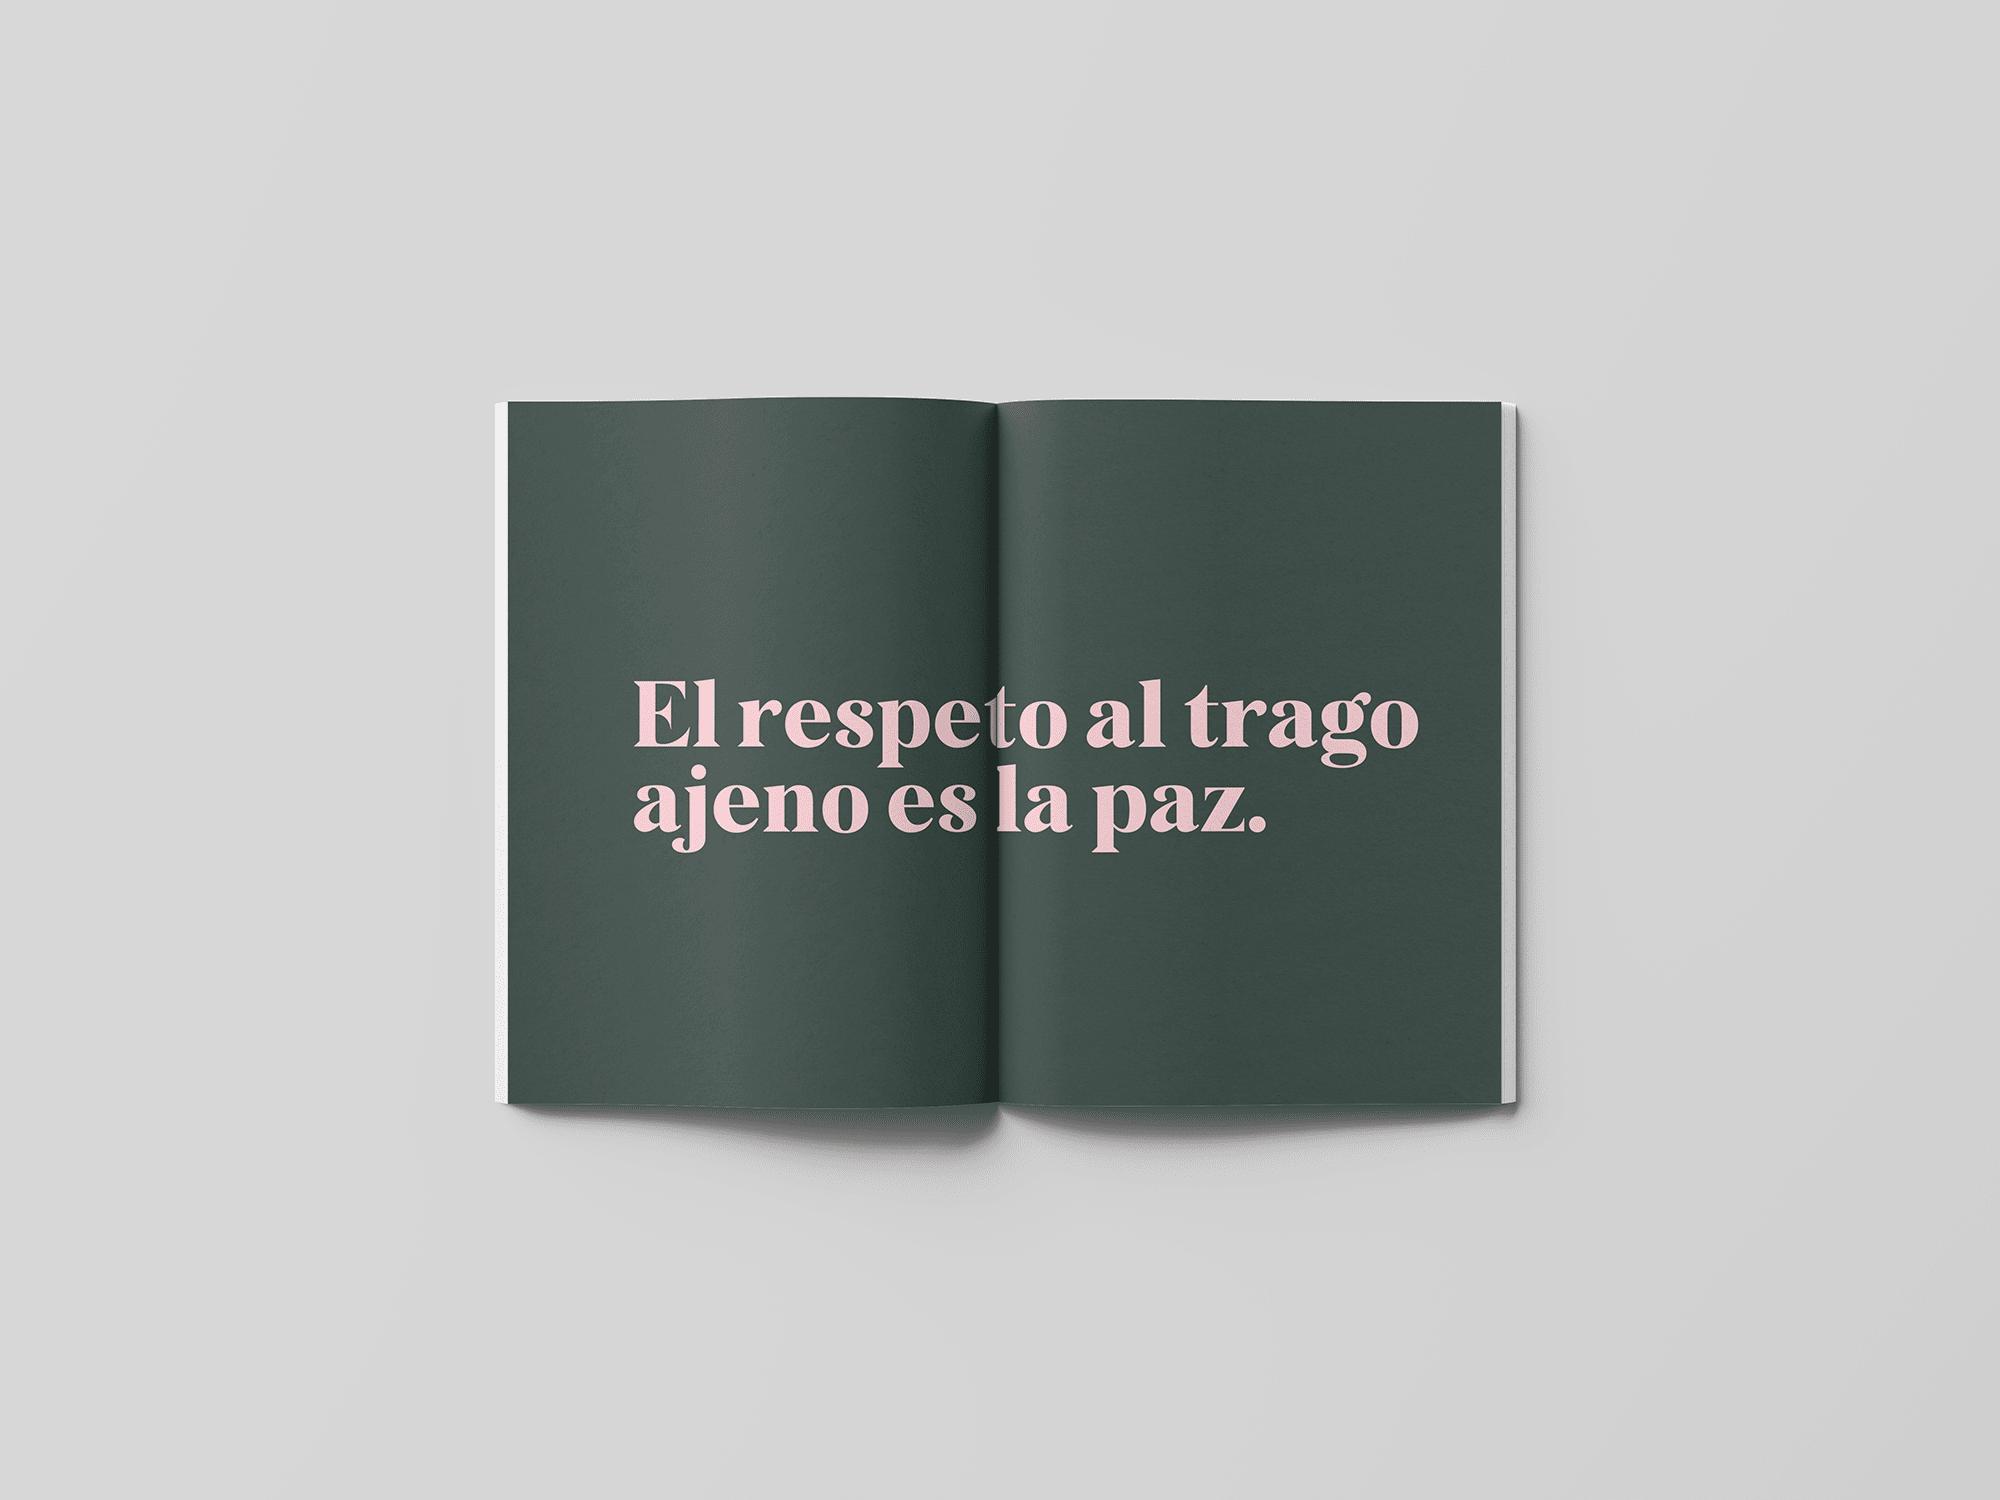 spread-20-book-agave-yoenpaperland